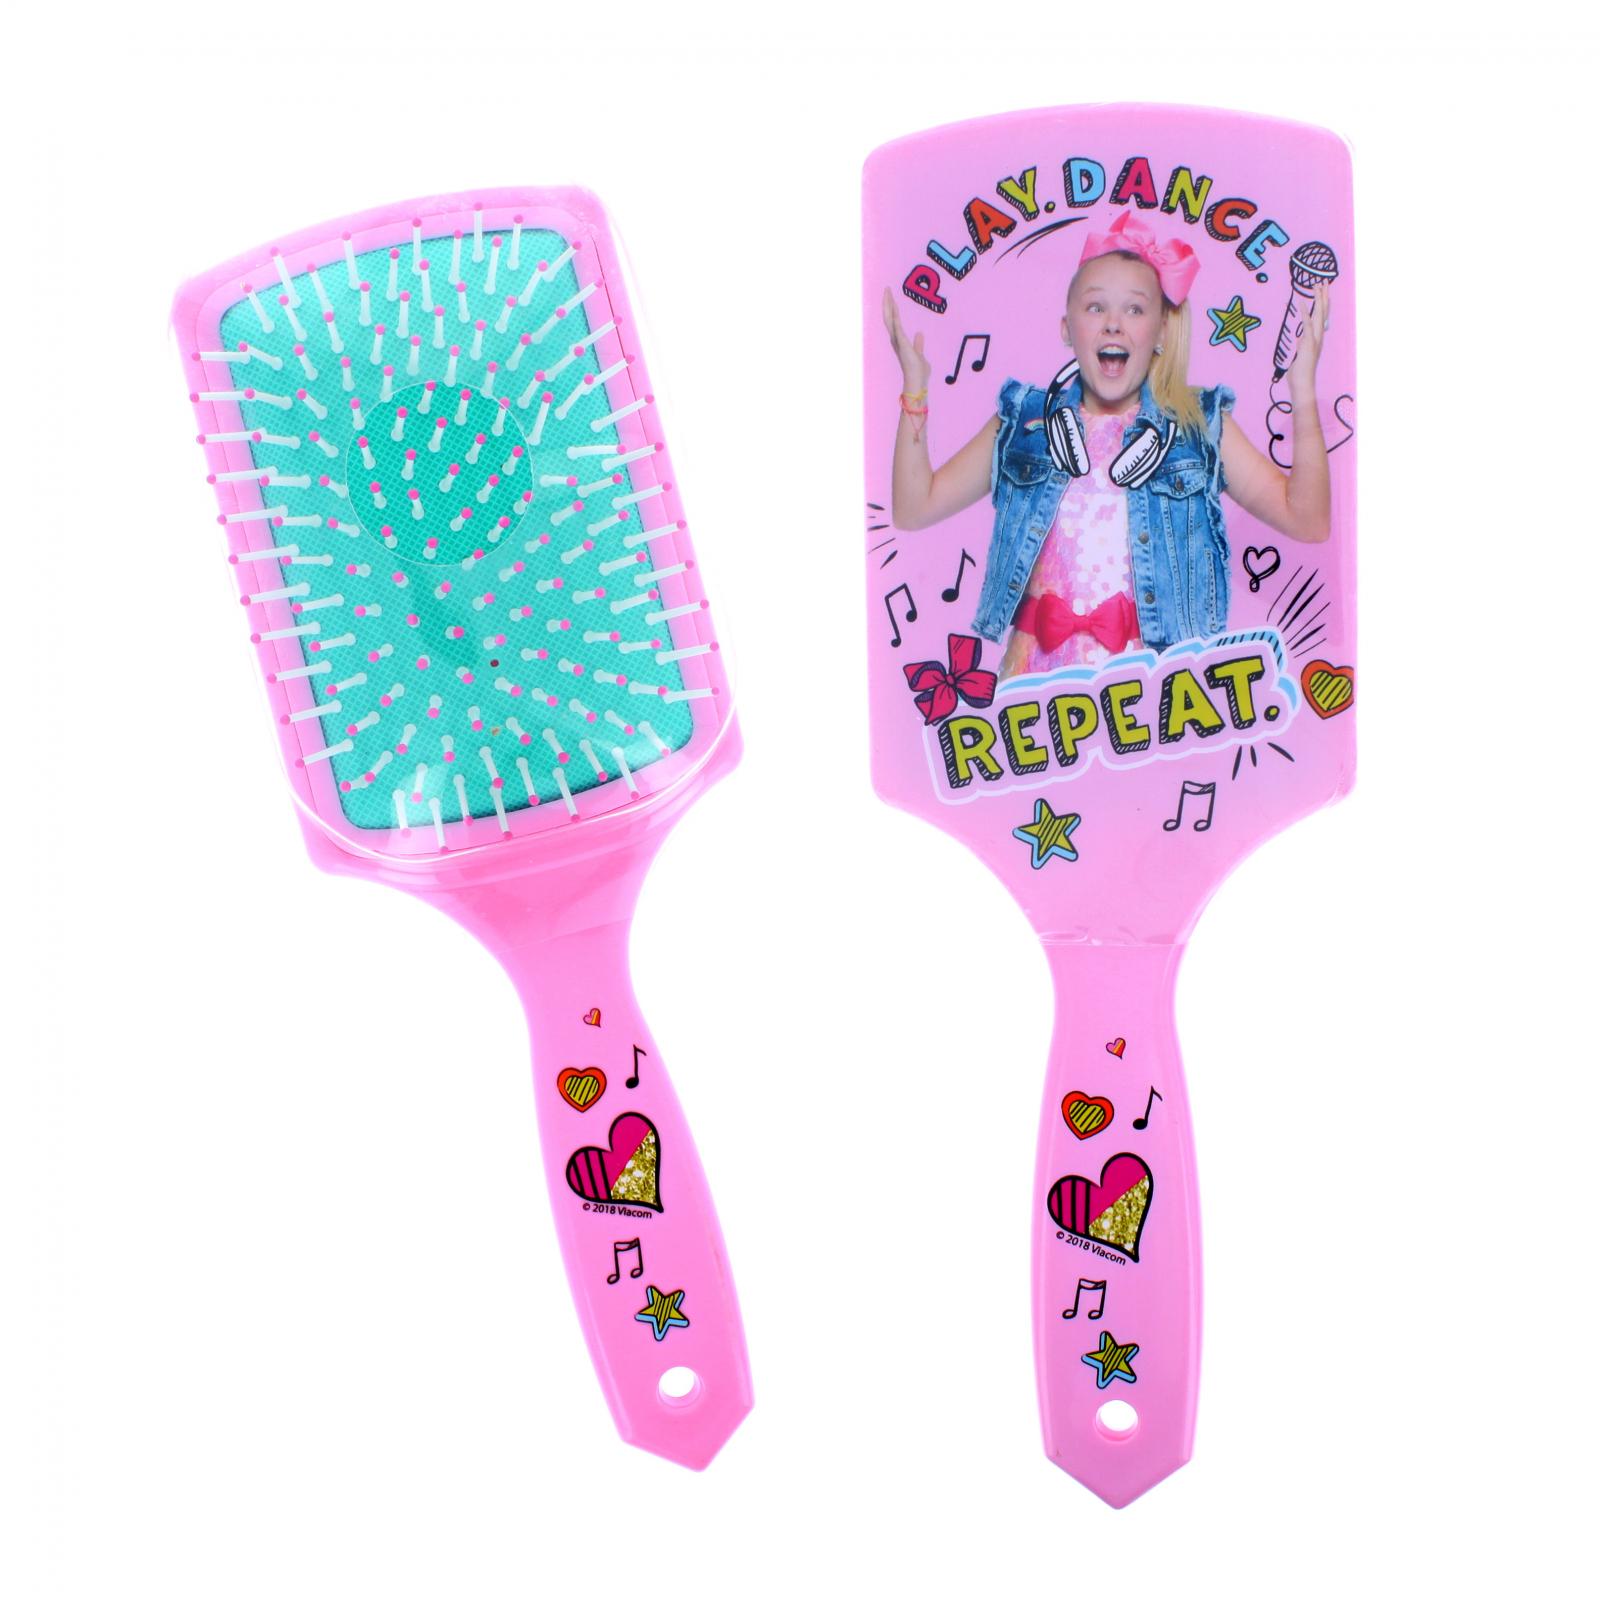 Nickelodeon JoJo Siwa Pink Printed Square Paddle Hair Brush